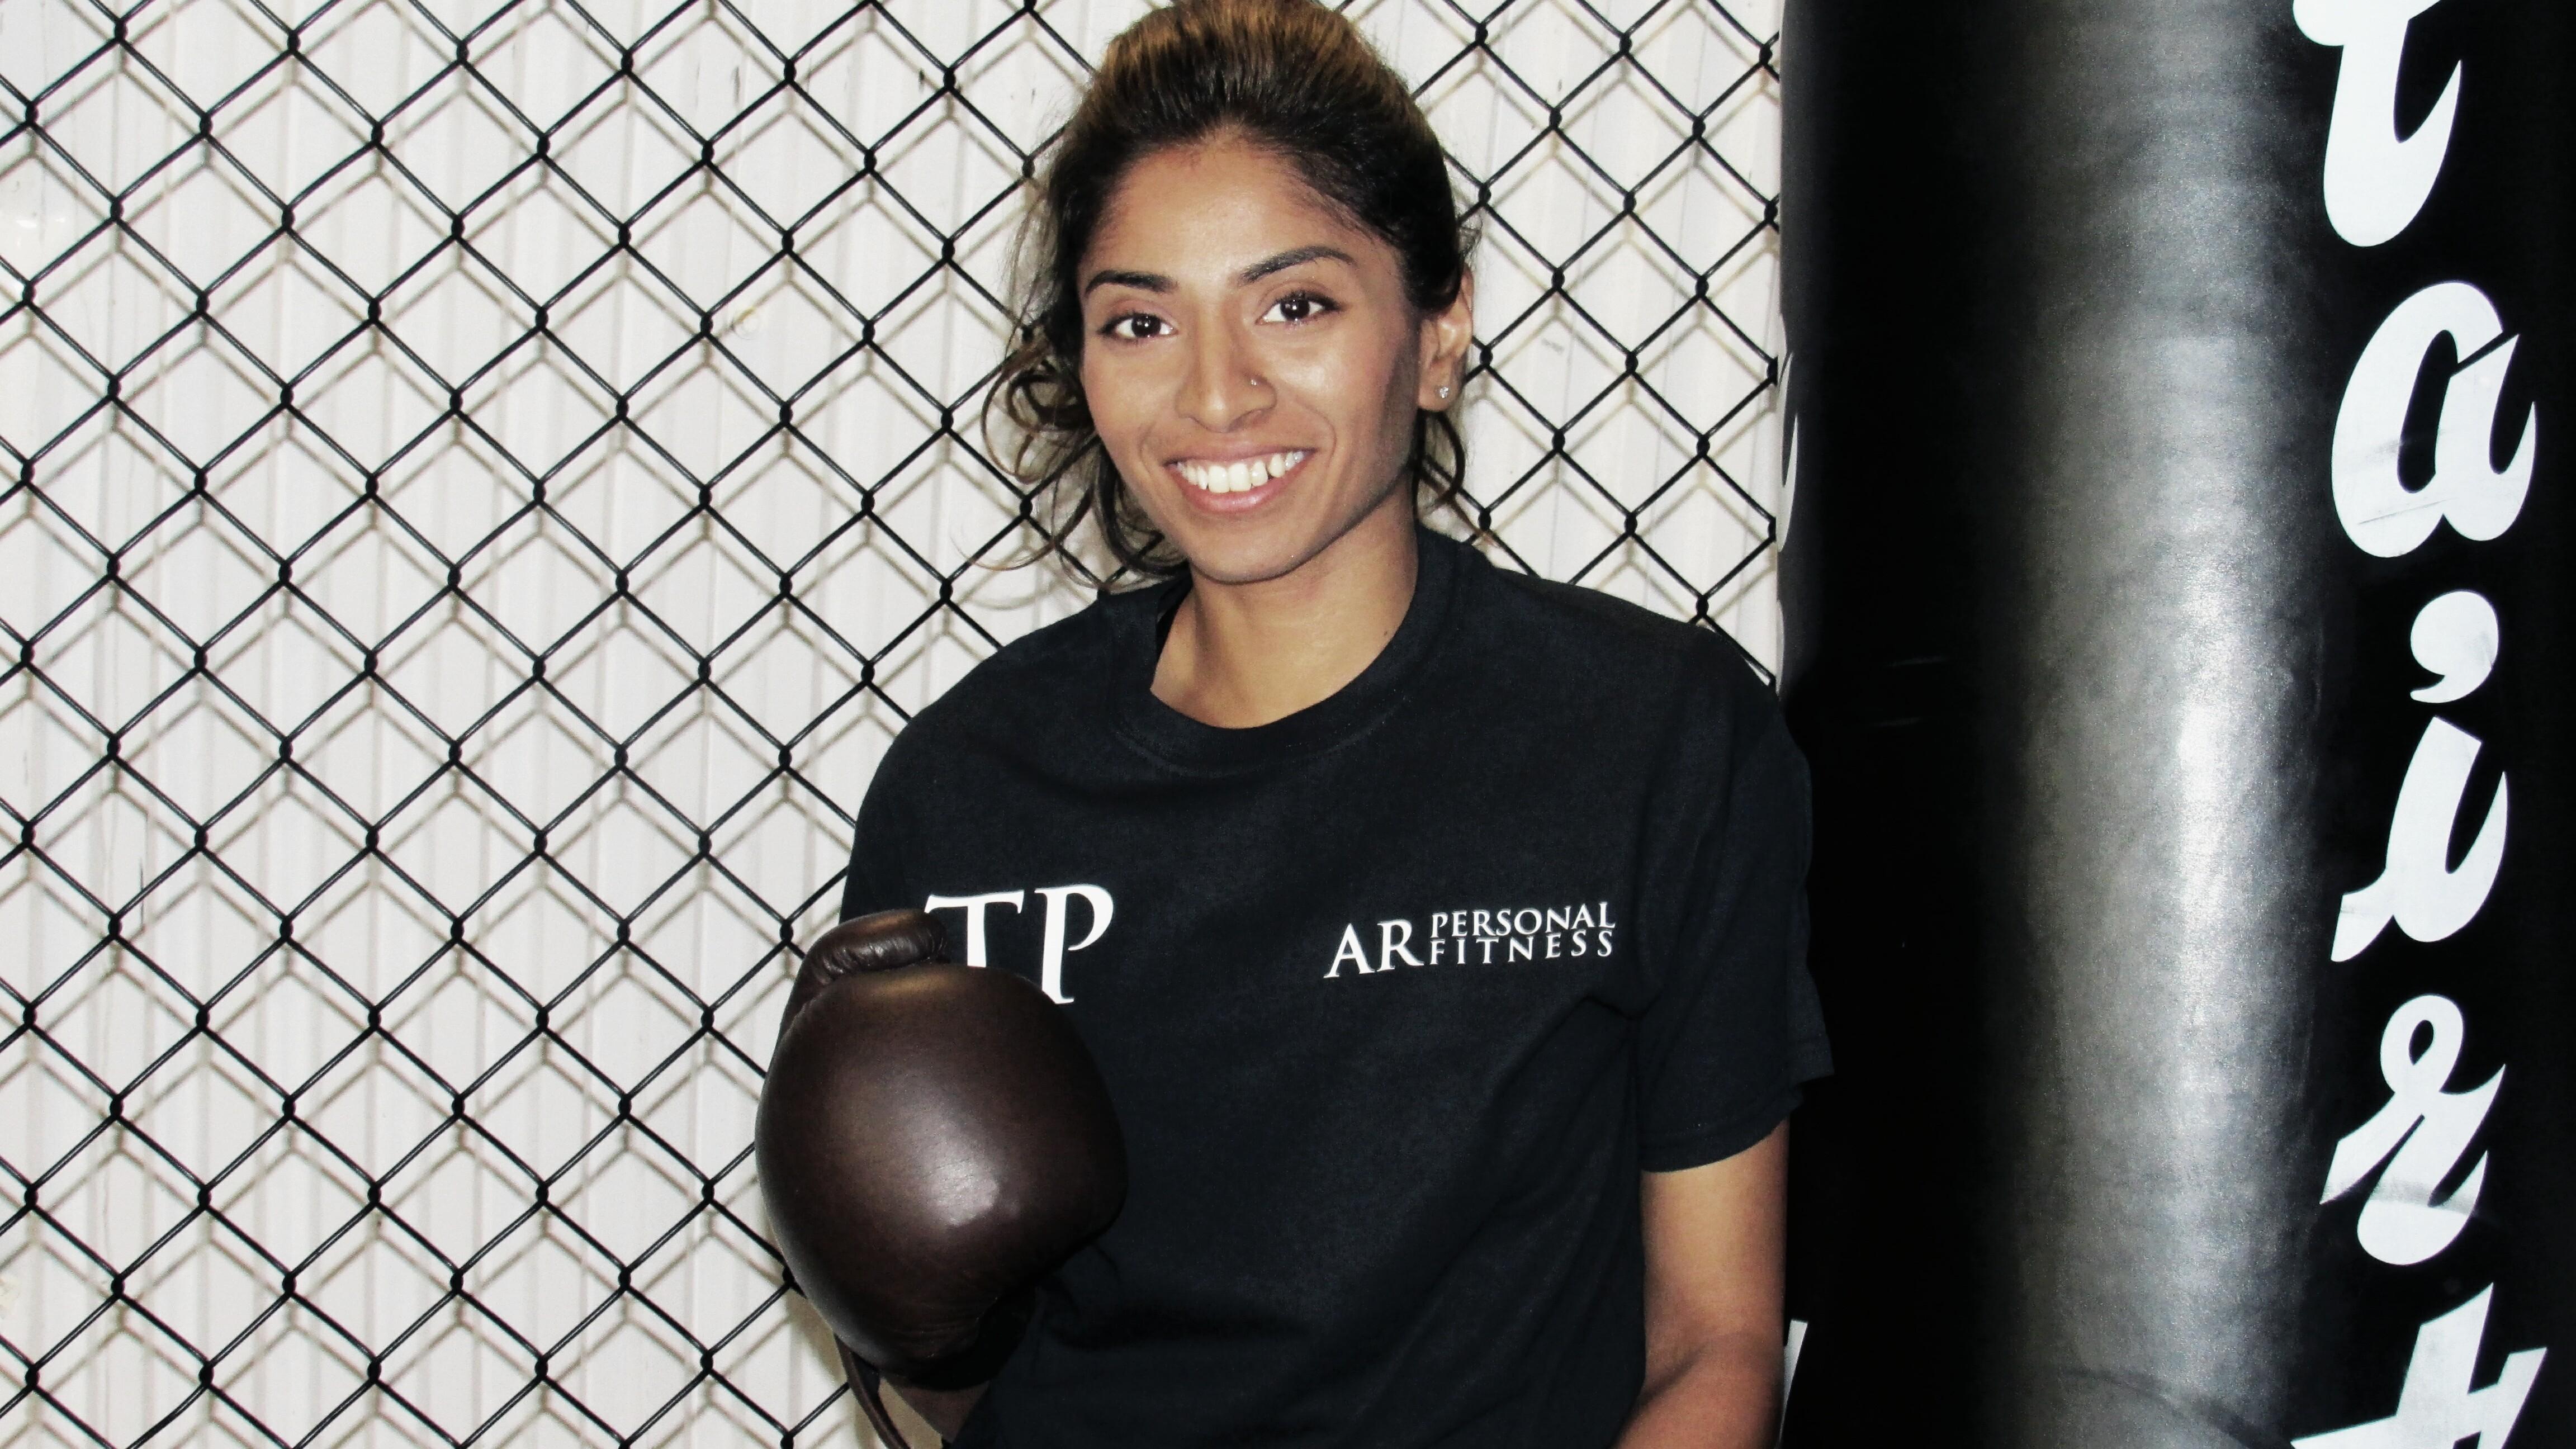 Tej Patel showing girl power